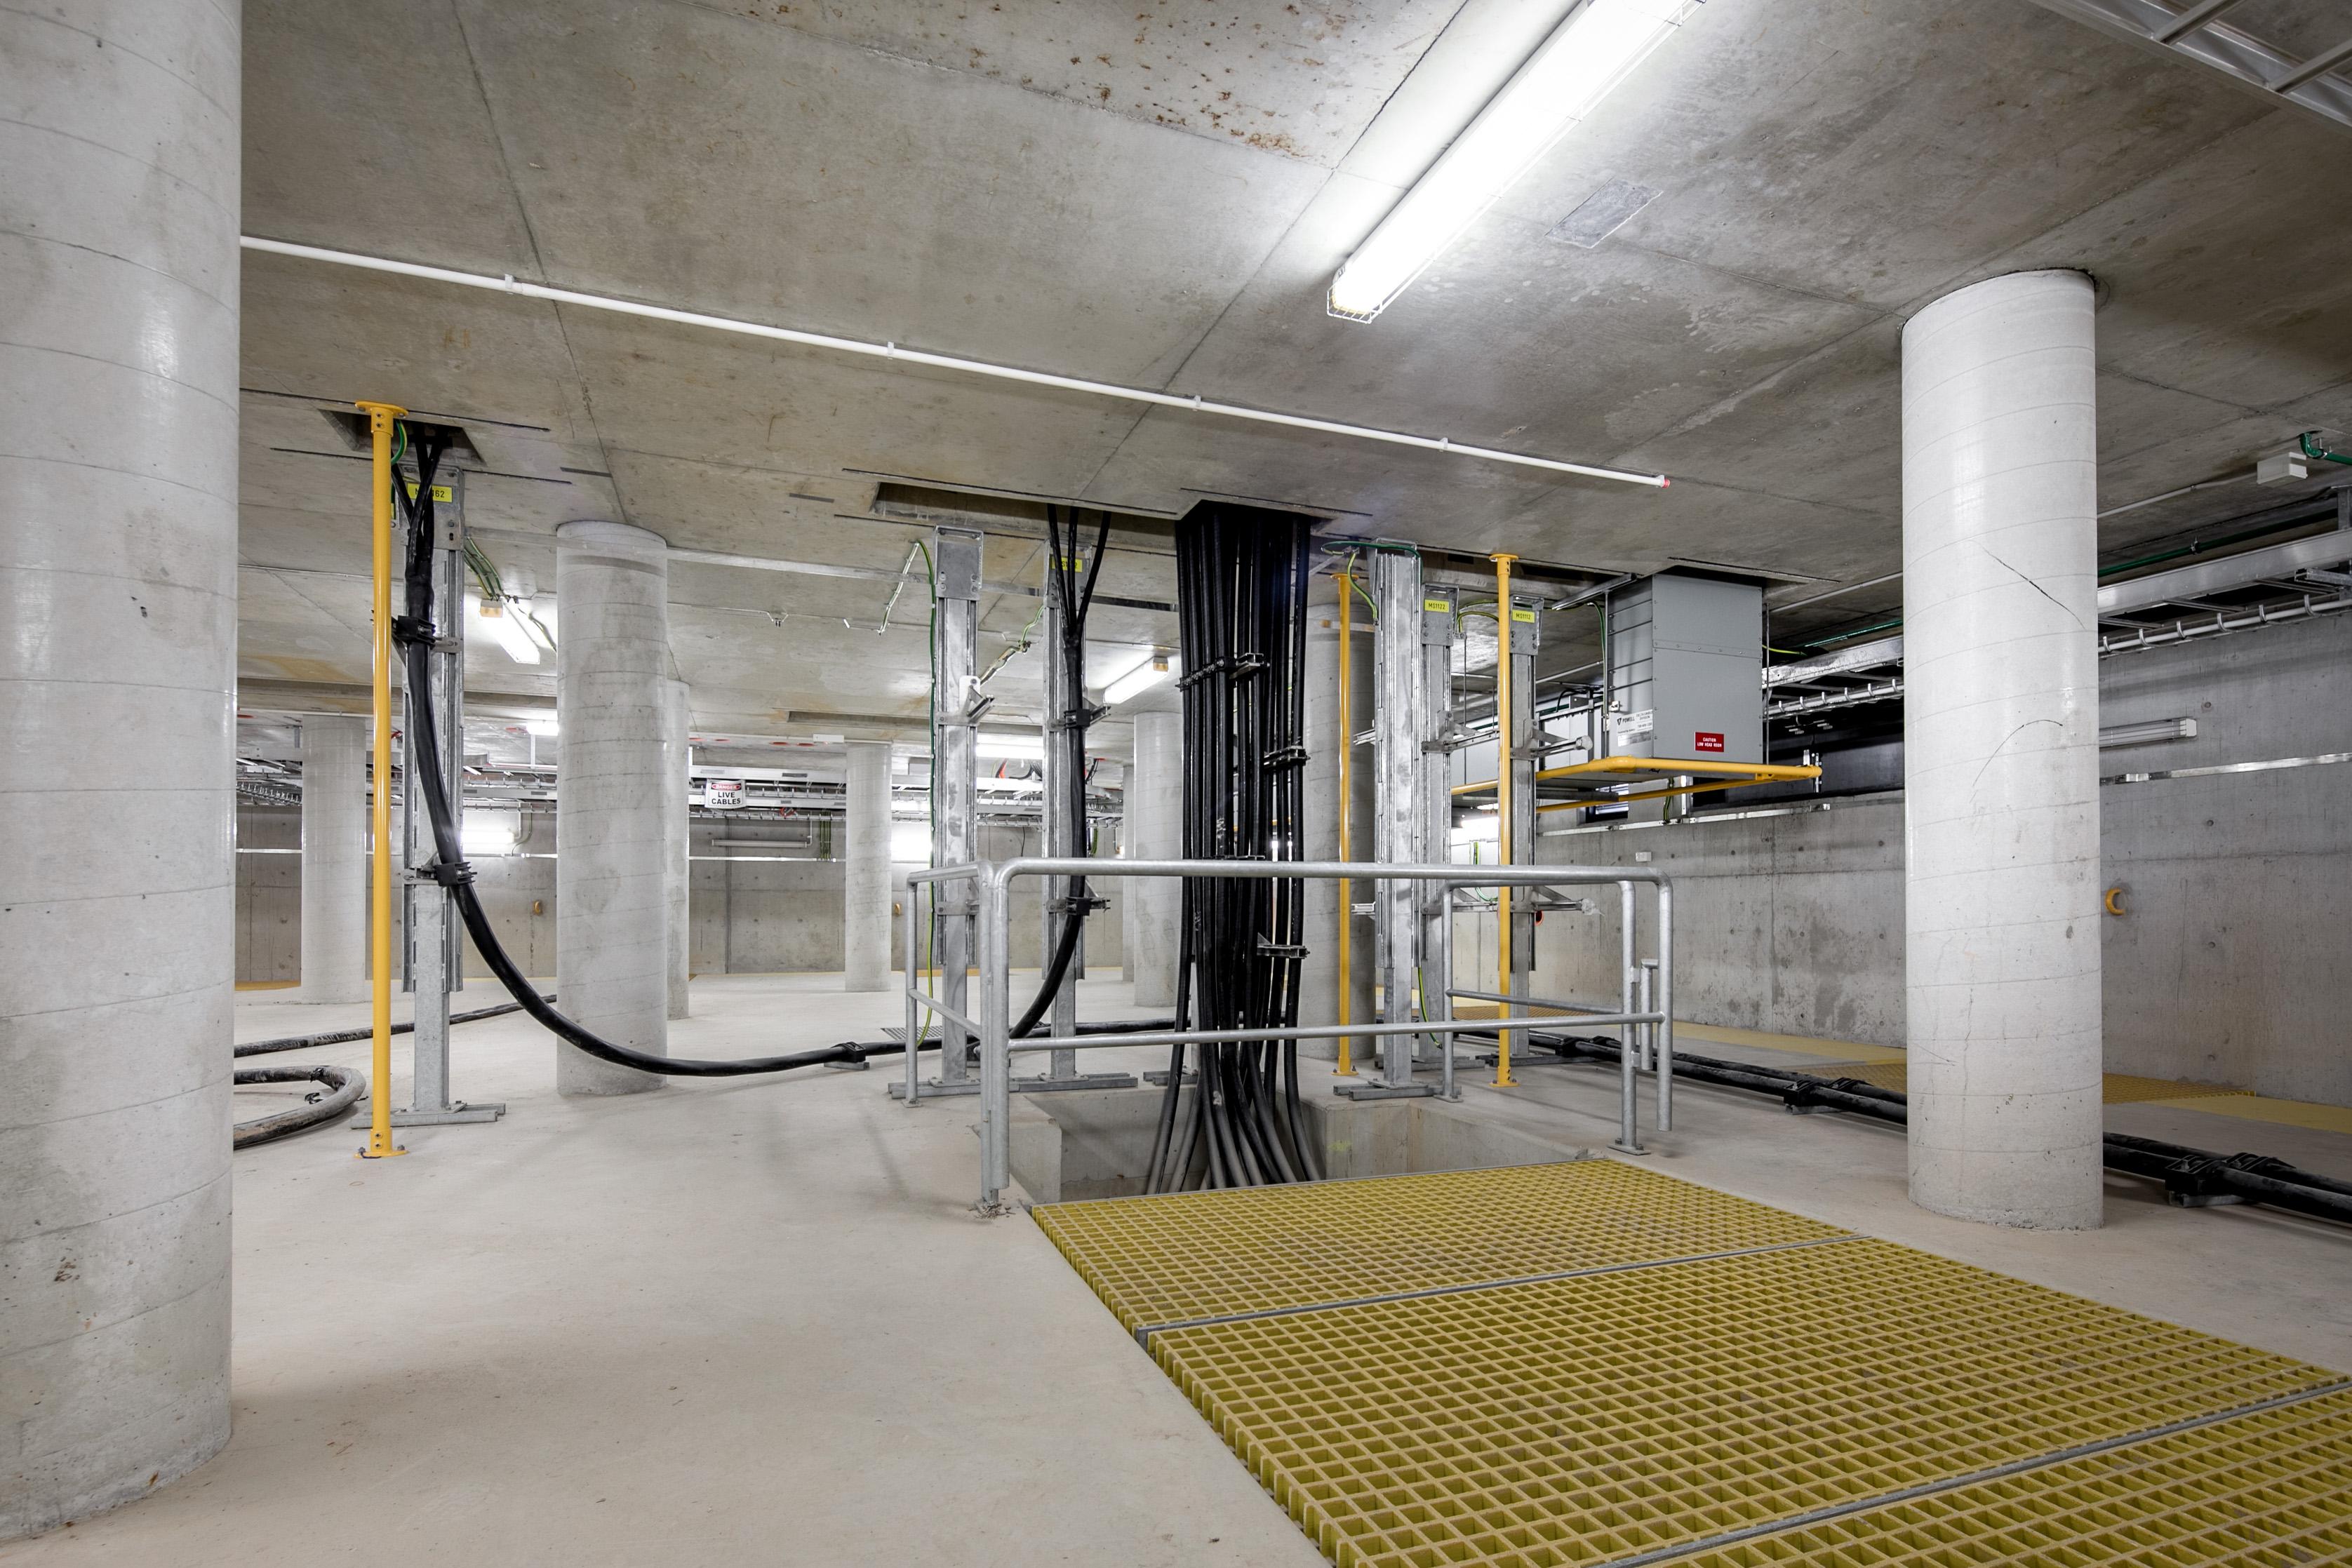 Gez-Xavier-Mansfield-Photography-Avant-Constructions-MarsdenPark-Substation-Project-August-2017-23